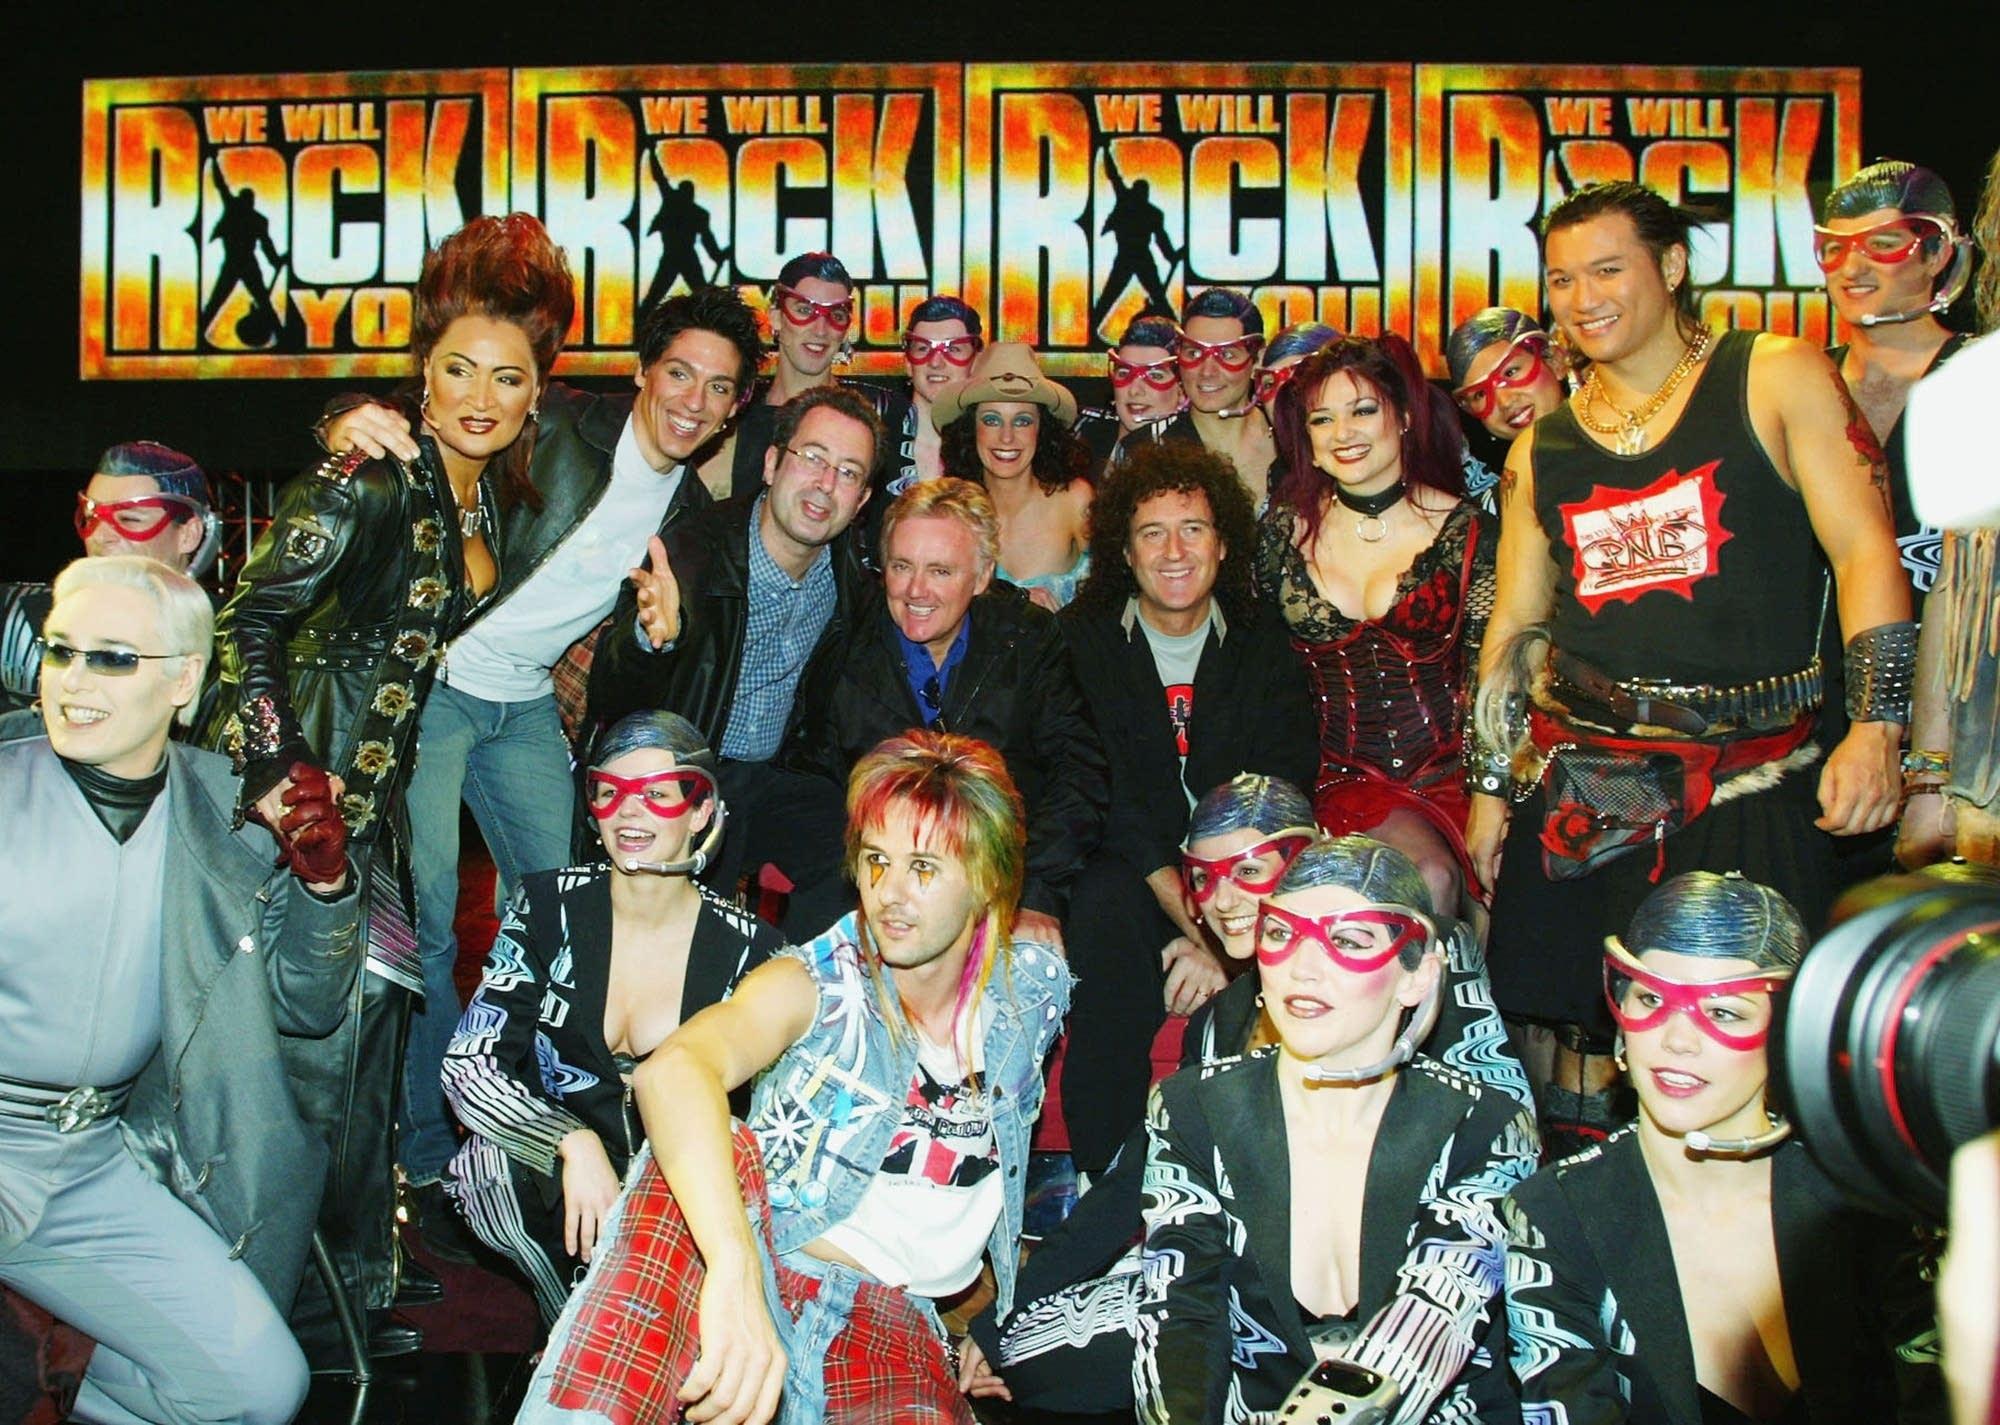 Queen musical 'We Will Rock You'